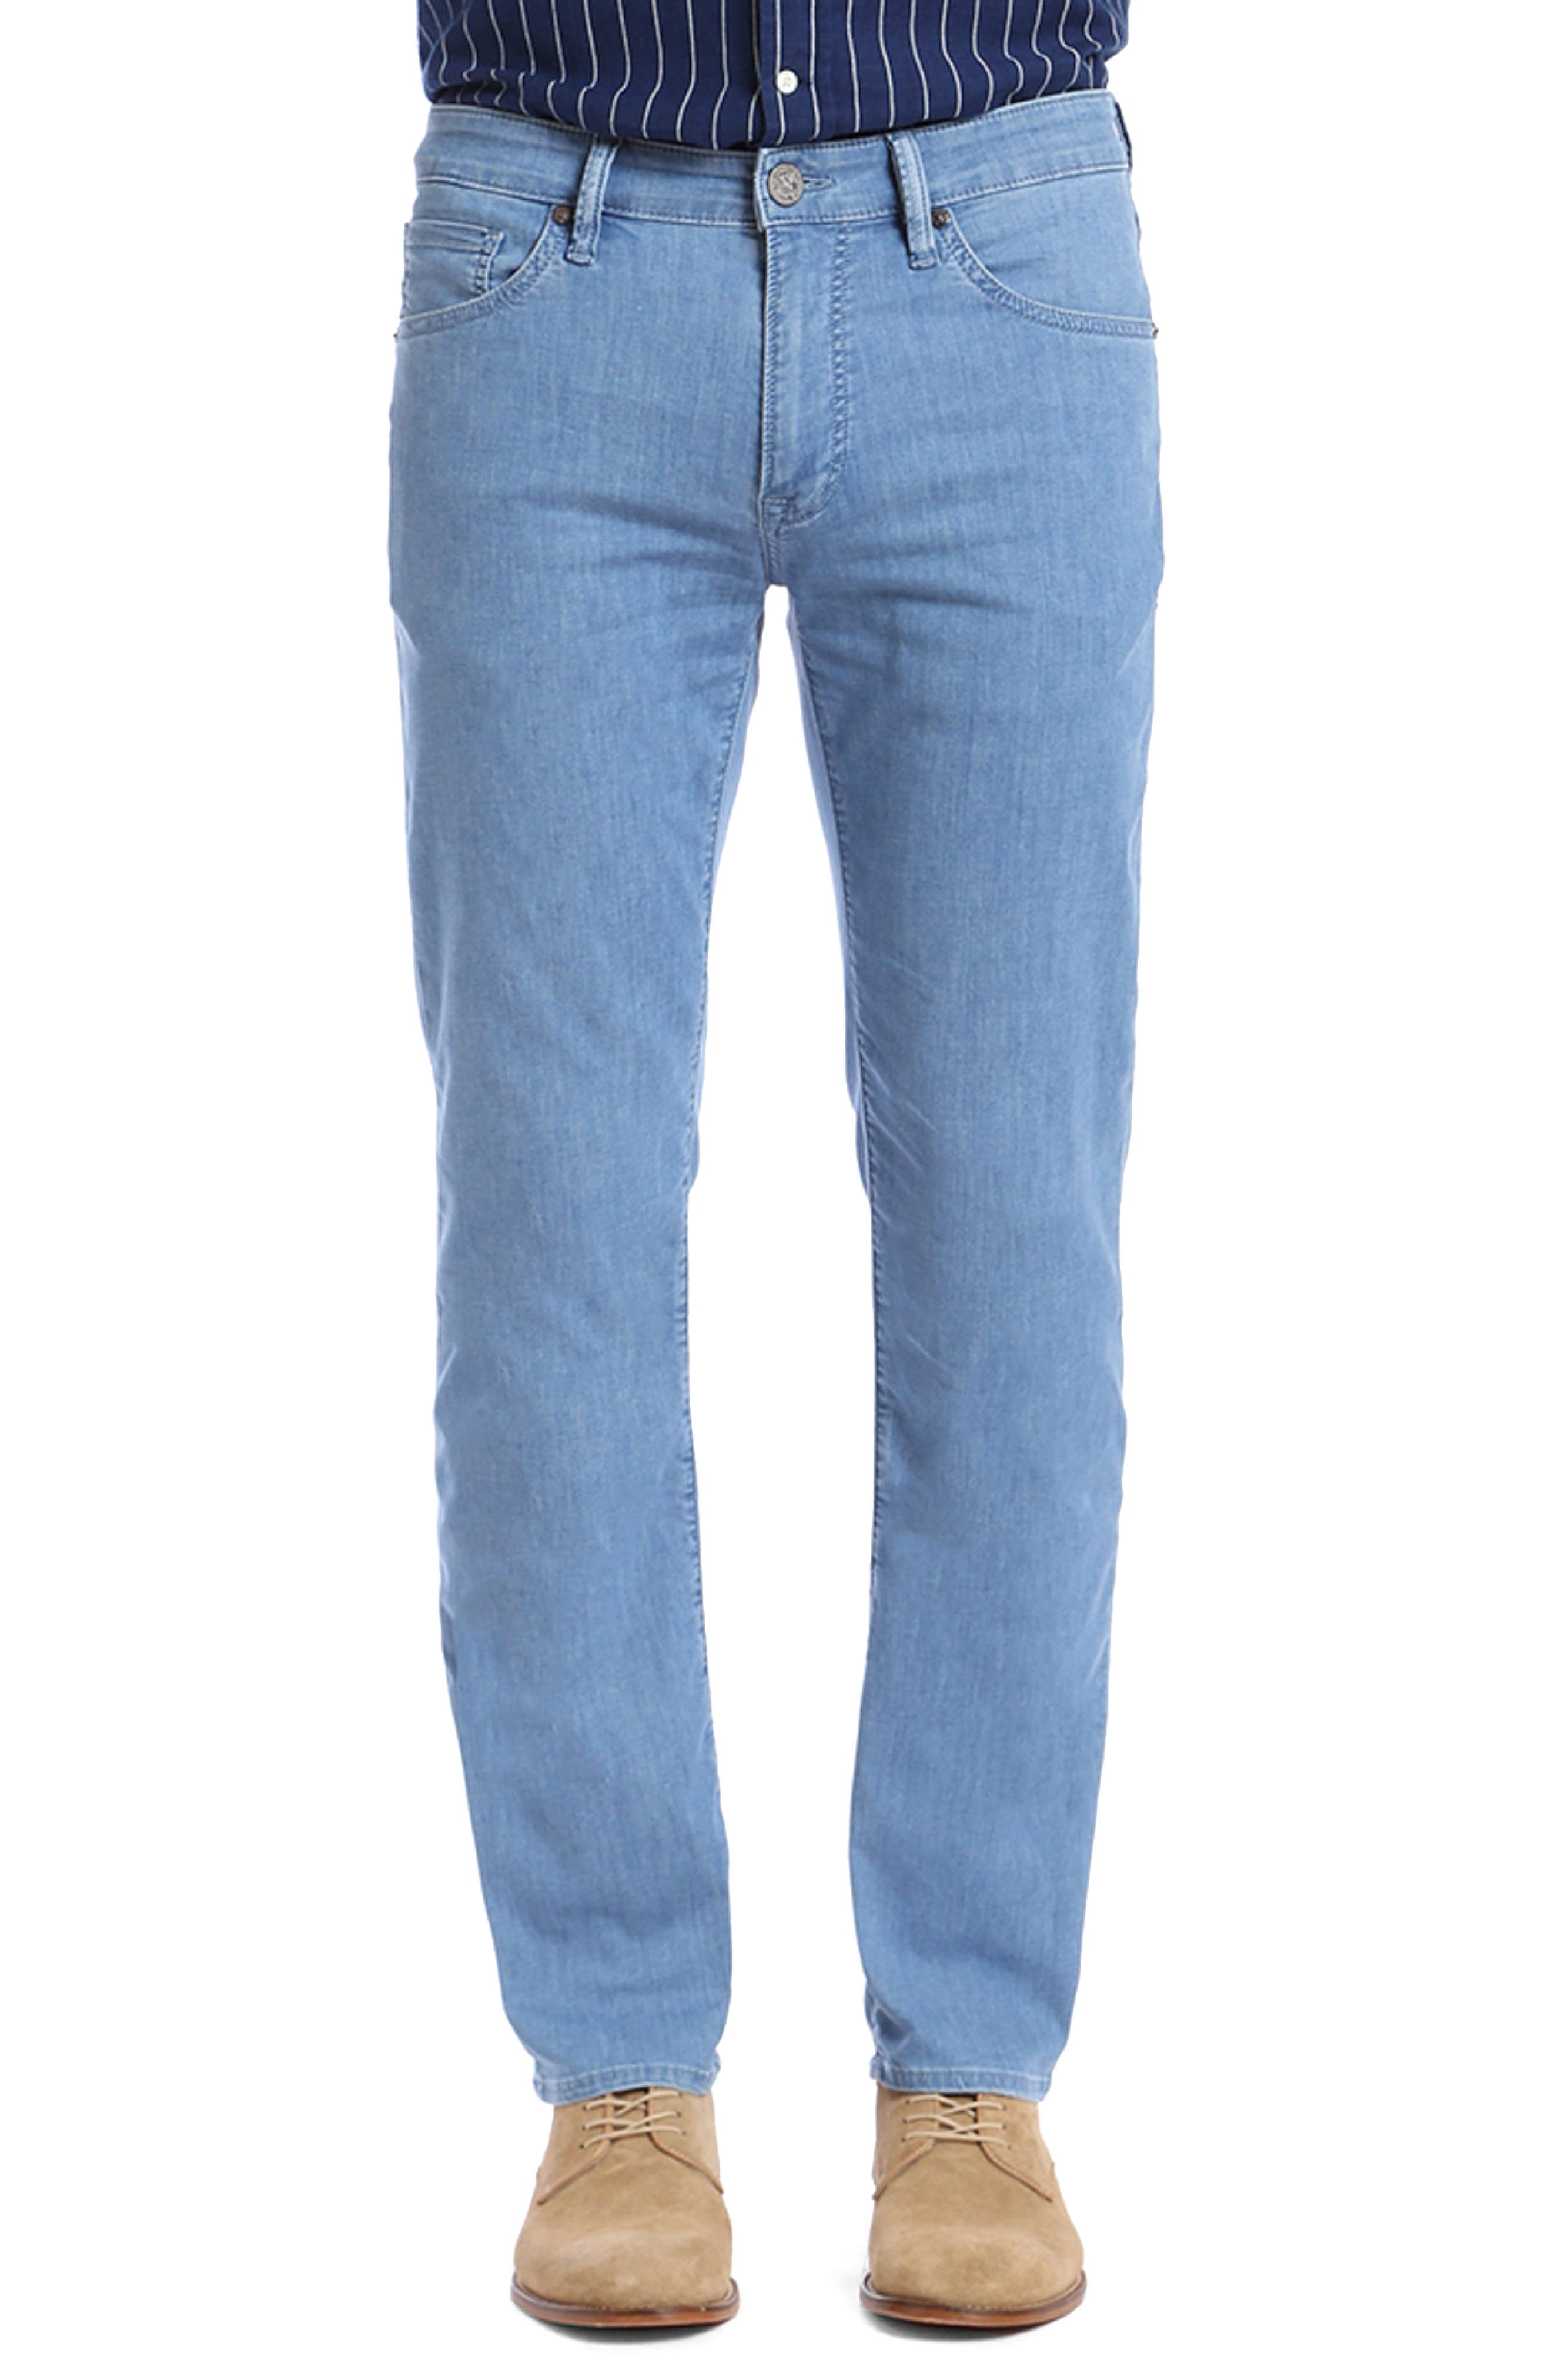 Charisma Relaxed Fit Jeans,                         Main,                         color, Light Maui Denim